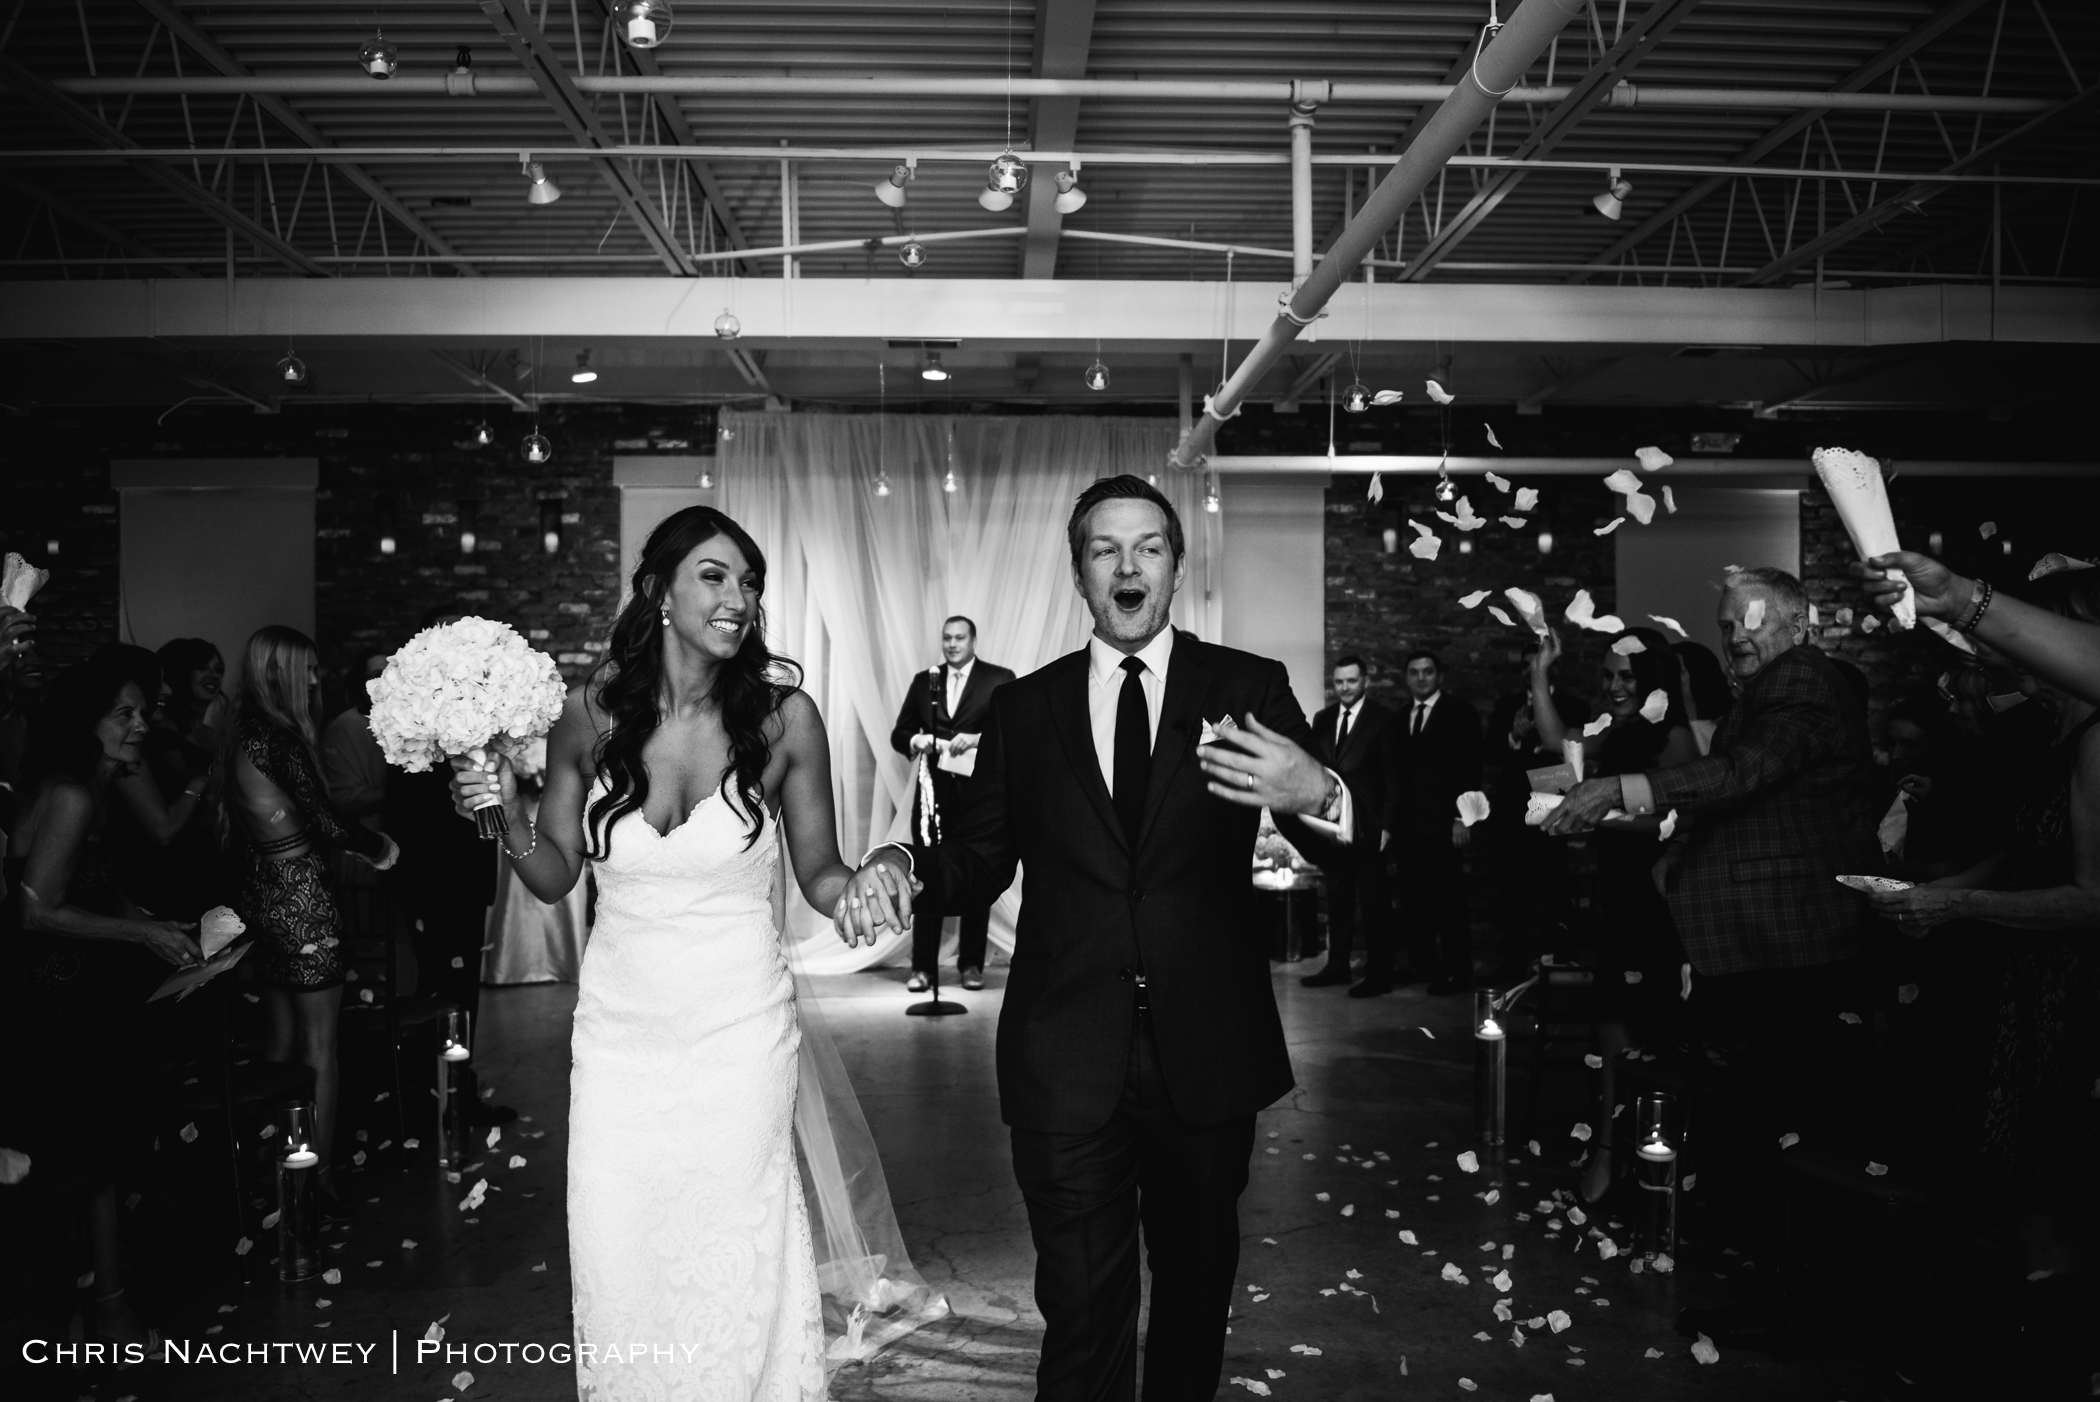 artistic-ct-wedding-photographers-chris-nachtwey-2017-30.jpg